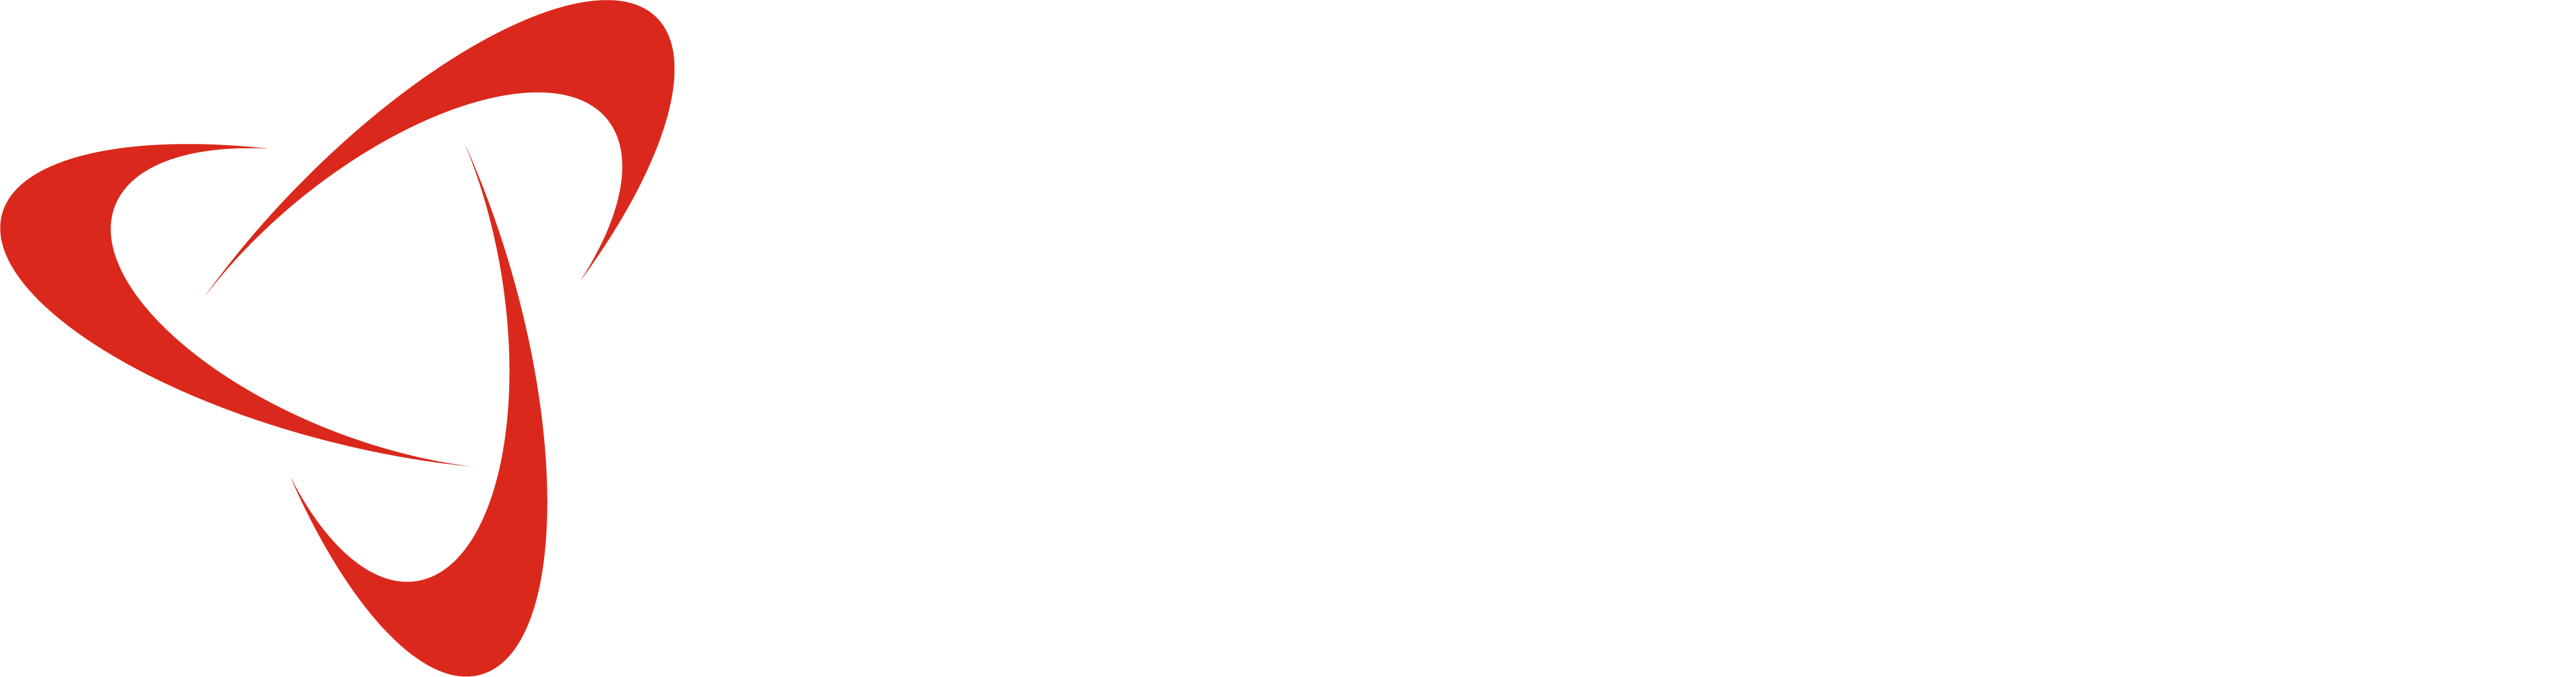 biospace logo white text red symbol